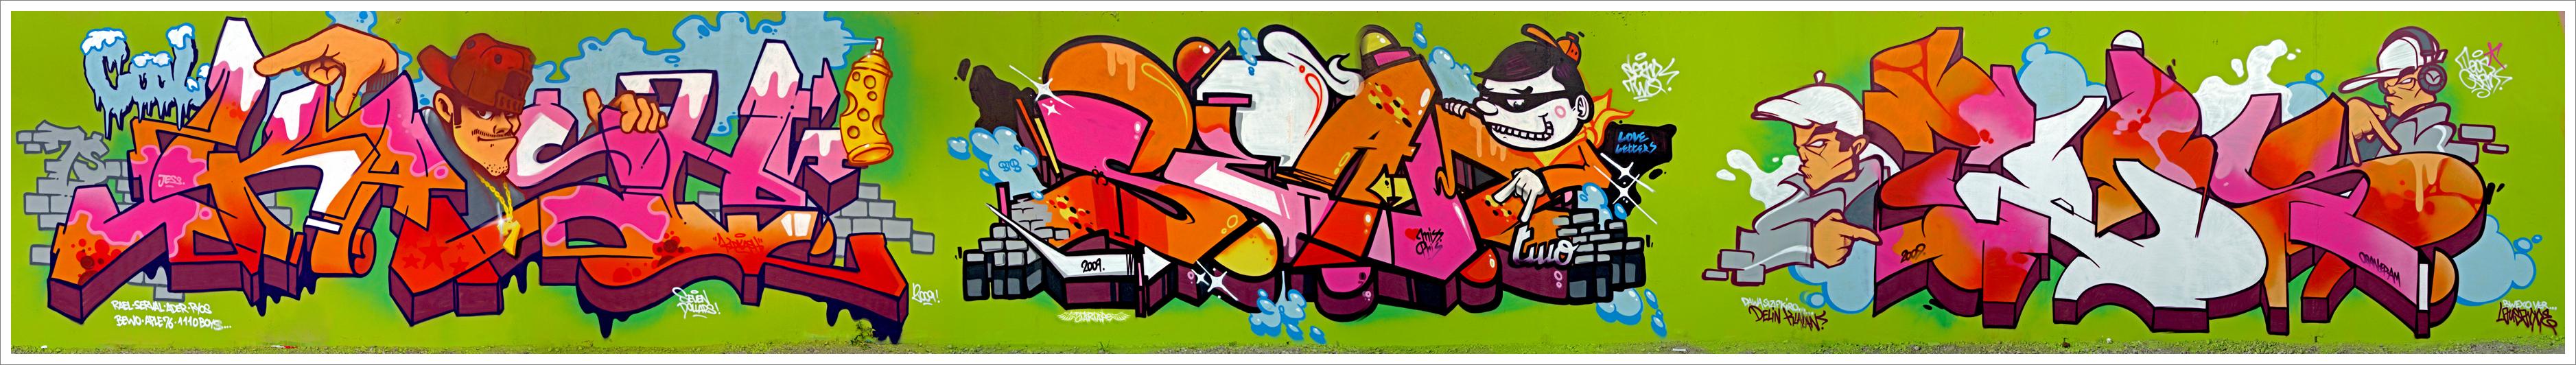 afarm4.static.flickr.com_3522_3958832760_d22377970a_o.jpg